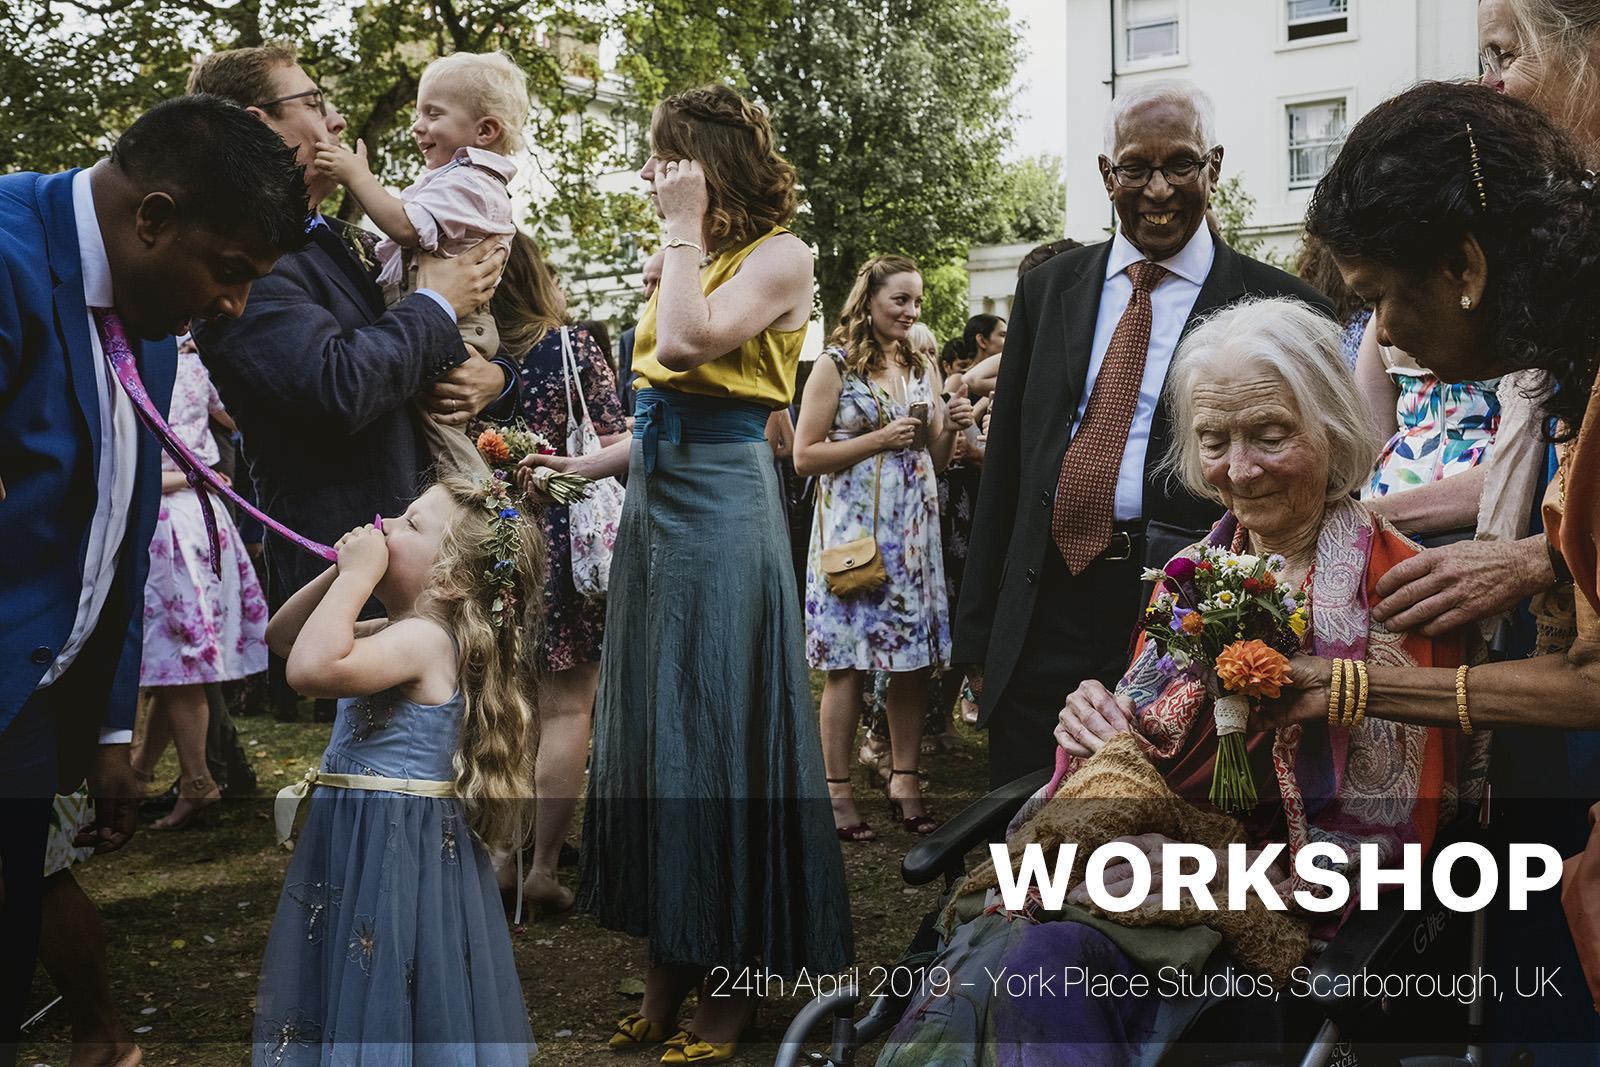 workshop-yorkplace-scarborough-banner